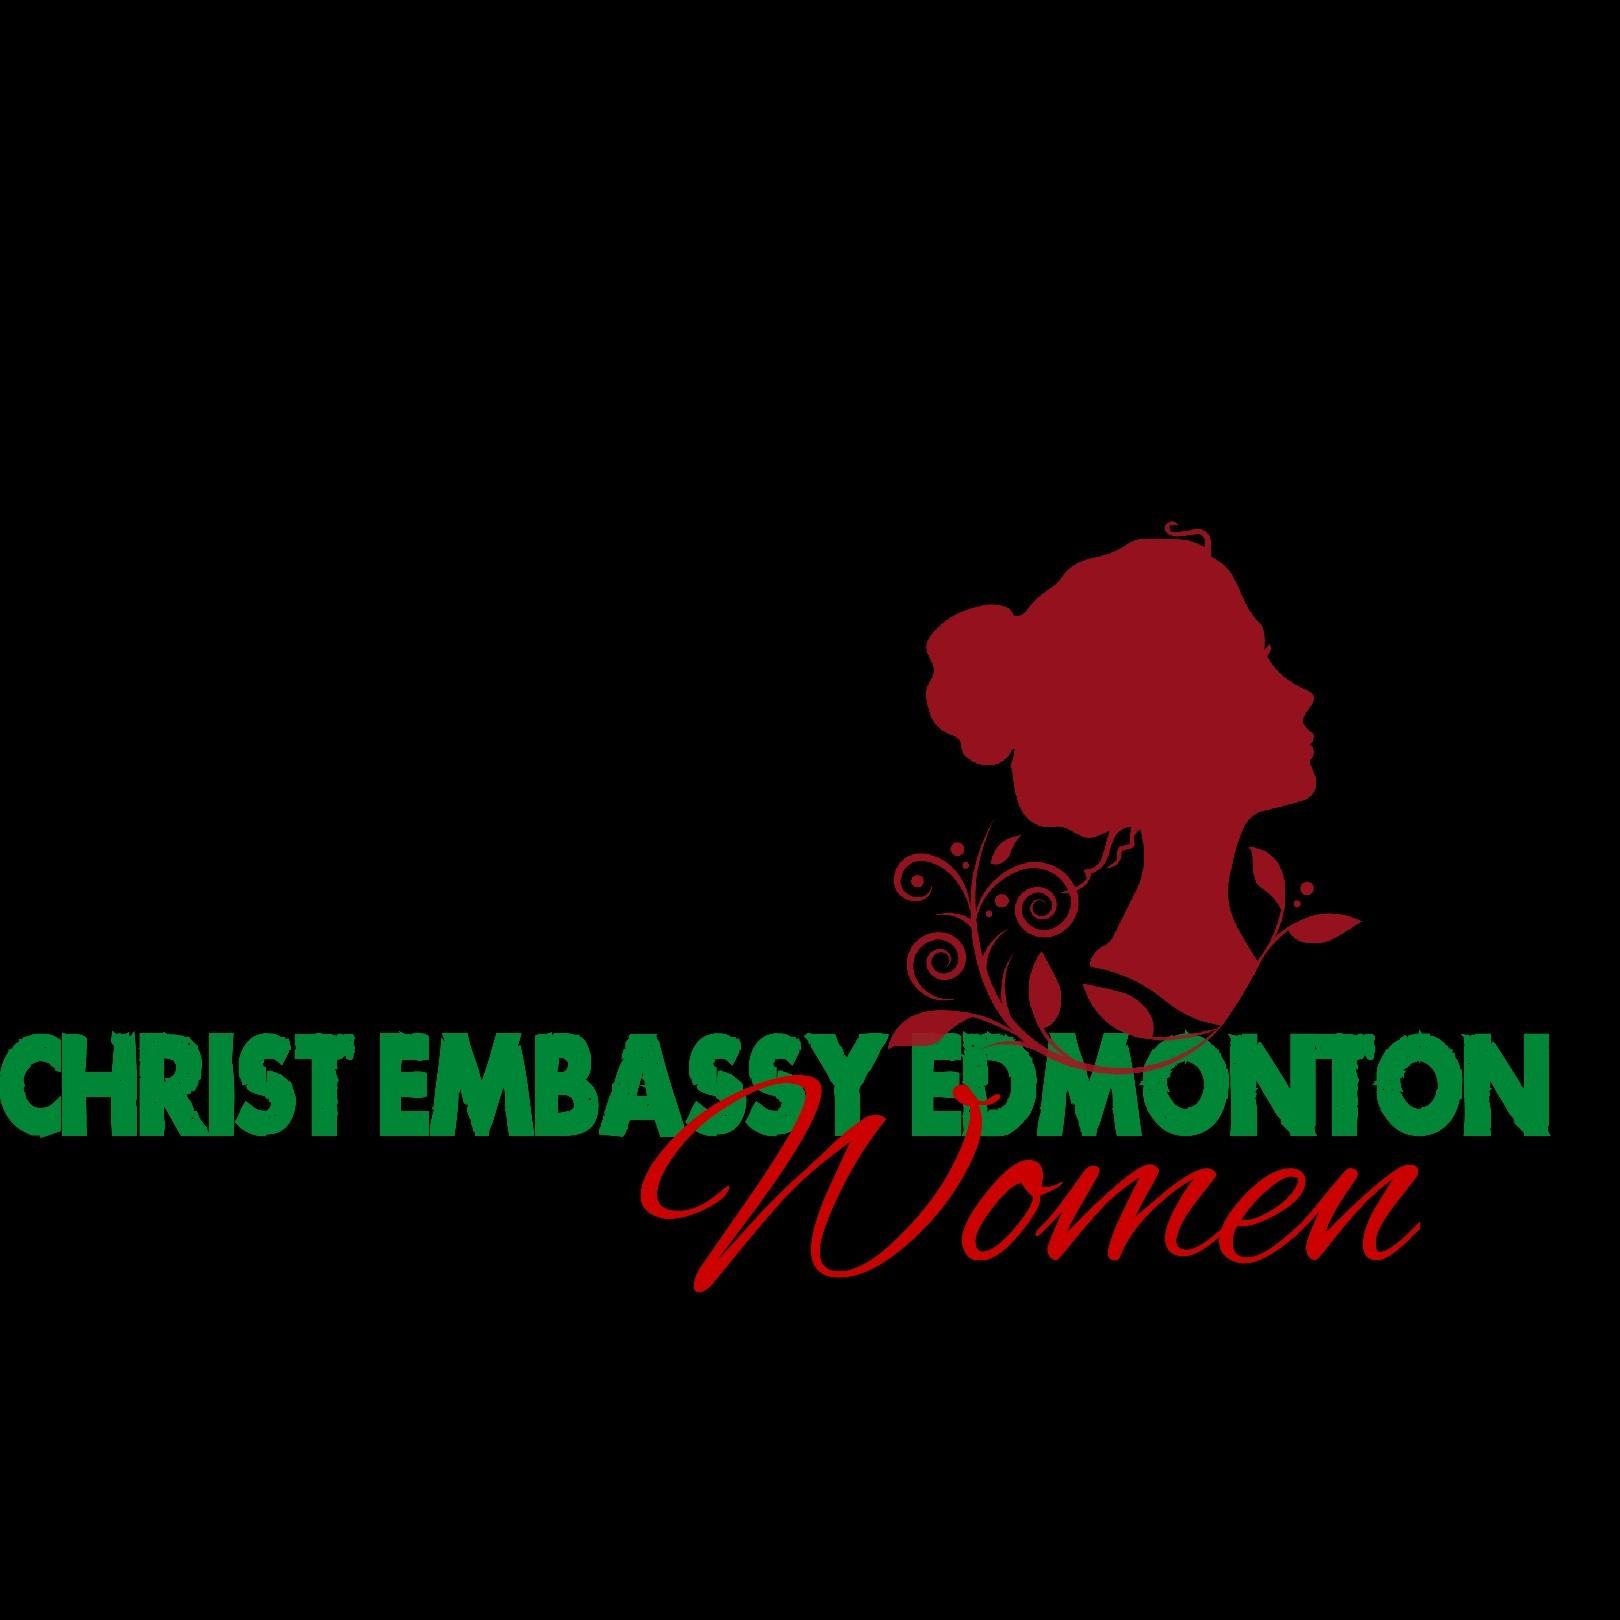 Christ Embassy Edmonton Women logo